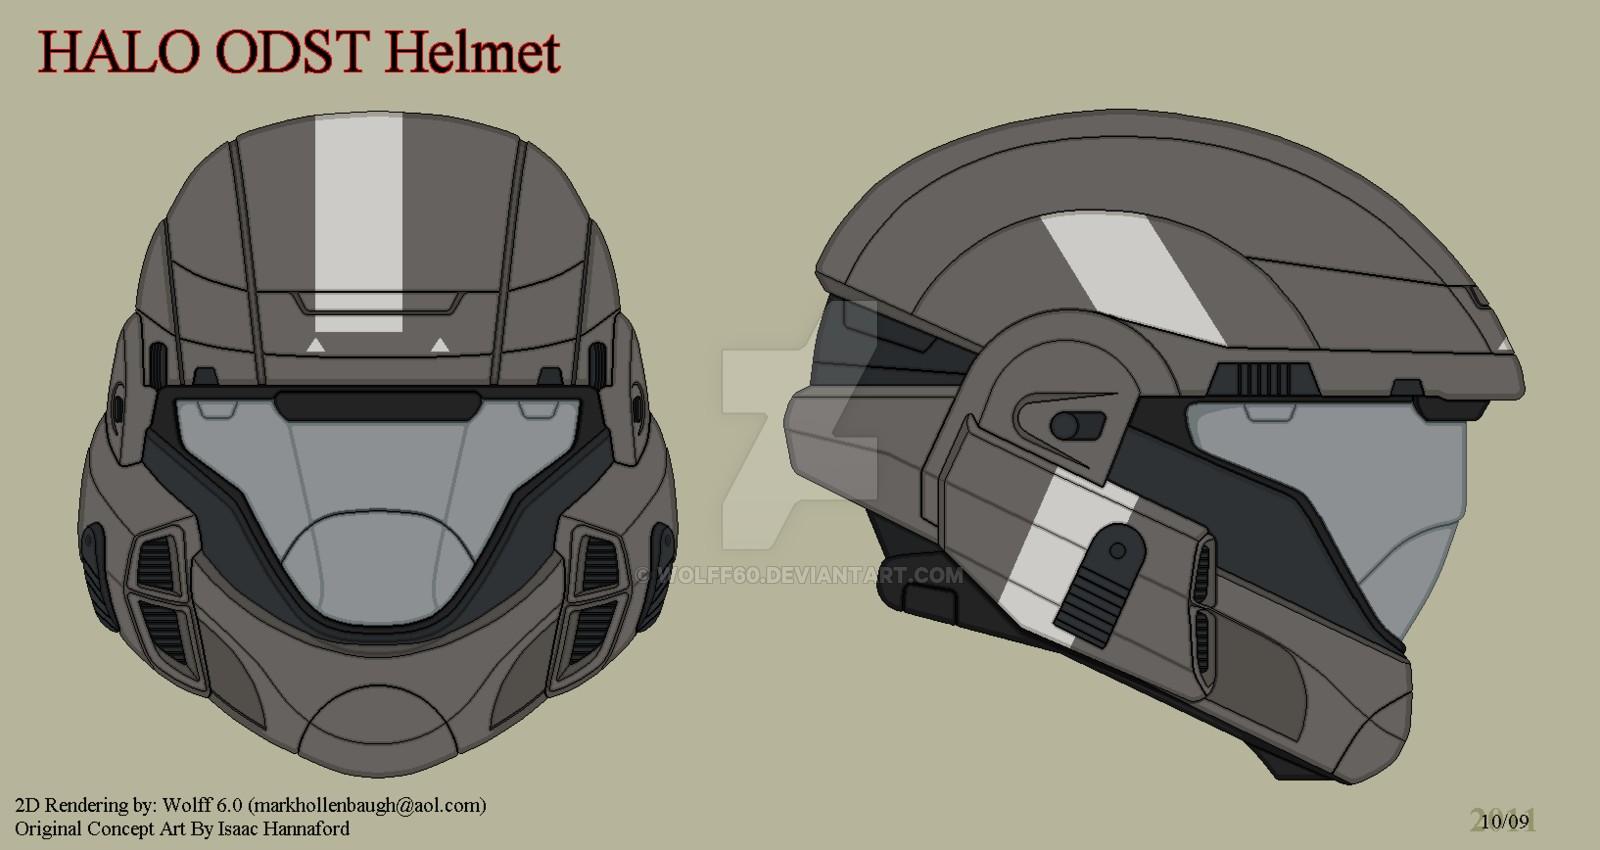 Halo Helmet Papercraft Halo Odst Helmet by Wolff60viantart On Deviantart